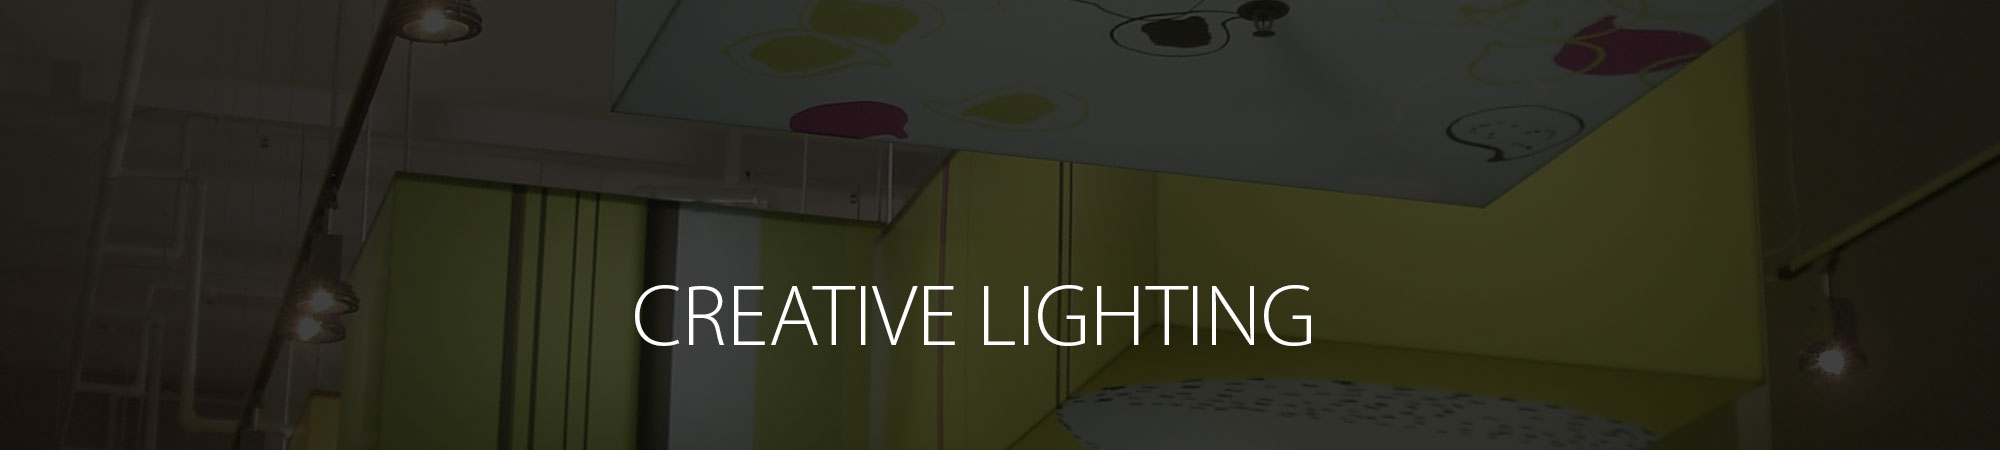 creative led lighting. Creative Led Lighting C